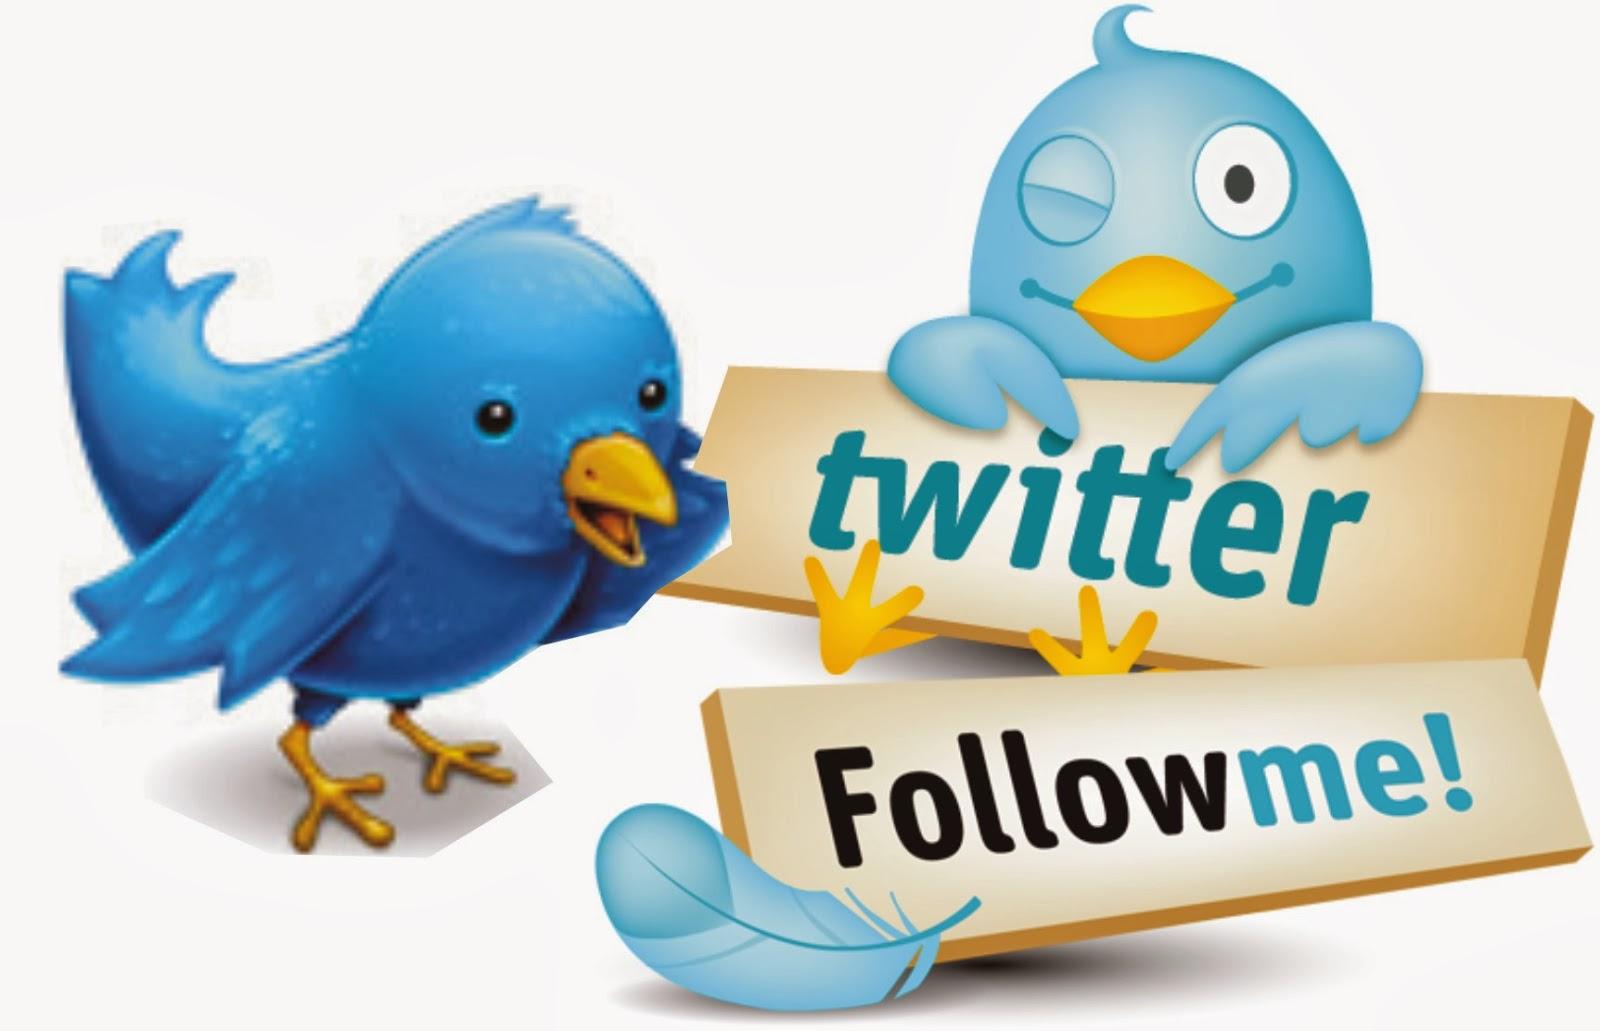 Cara Mendapatkan Follower Twitter Dengan Mudah dan Gratis